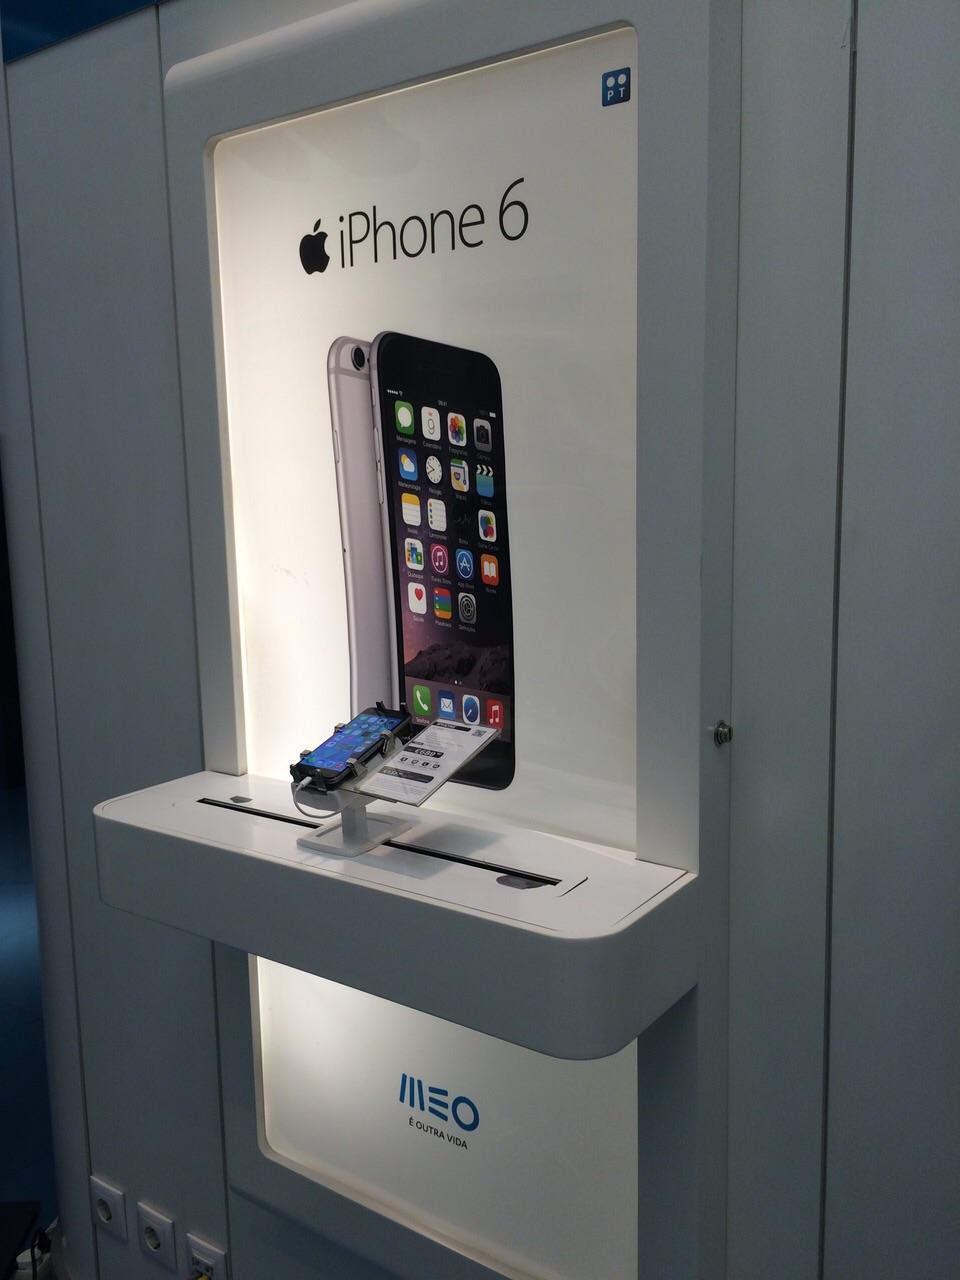 gripzo-iphone-6-secured-by.com-wall-display.jpg